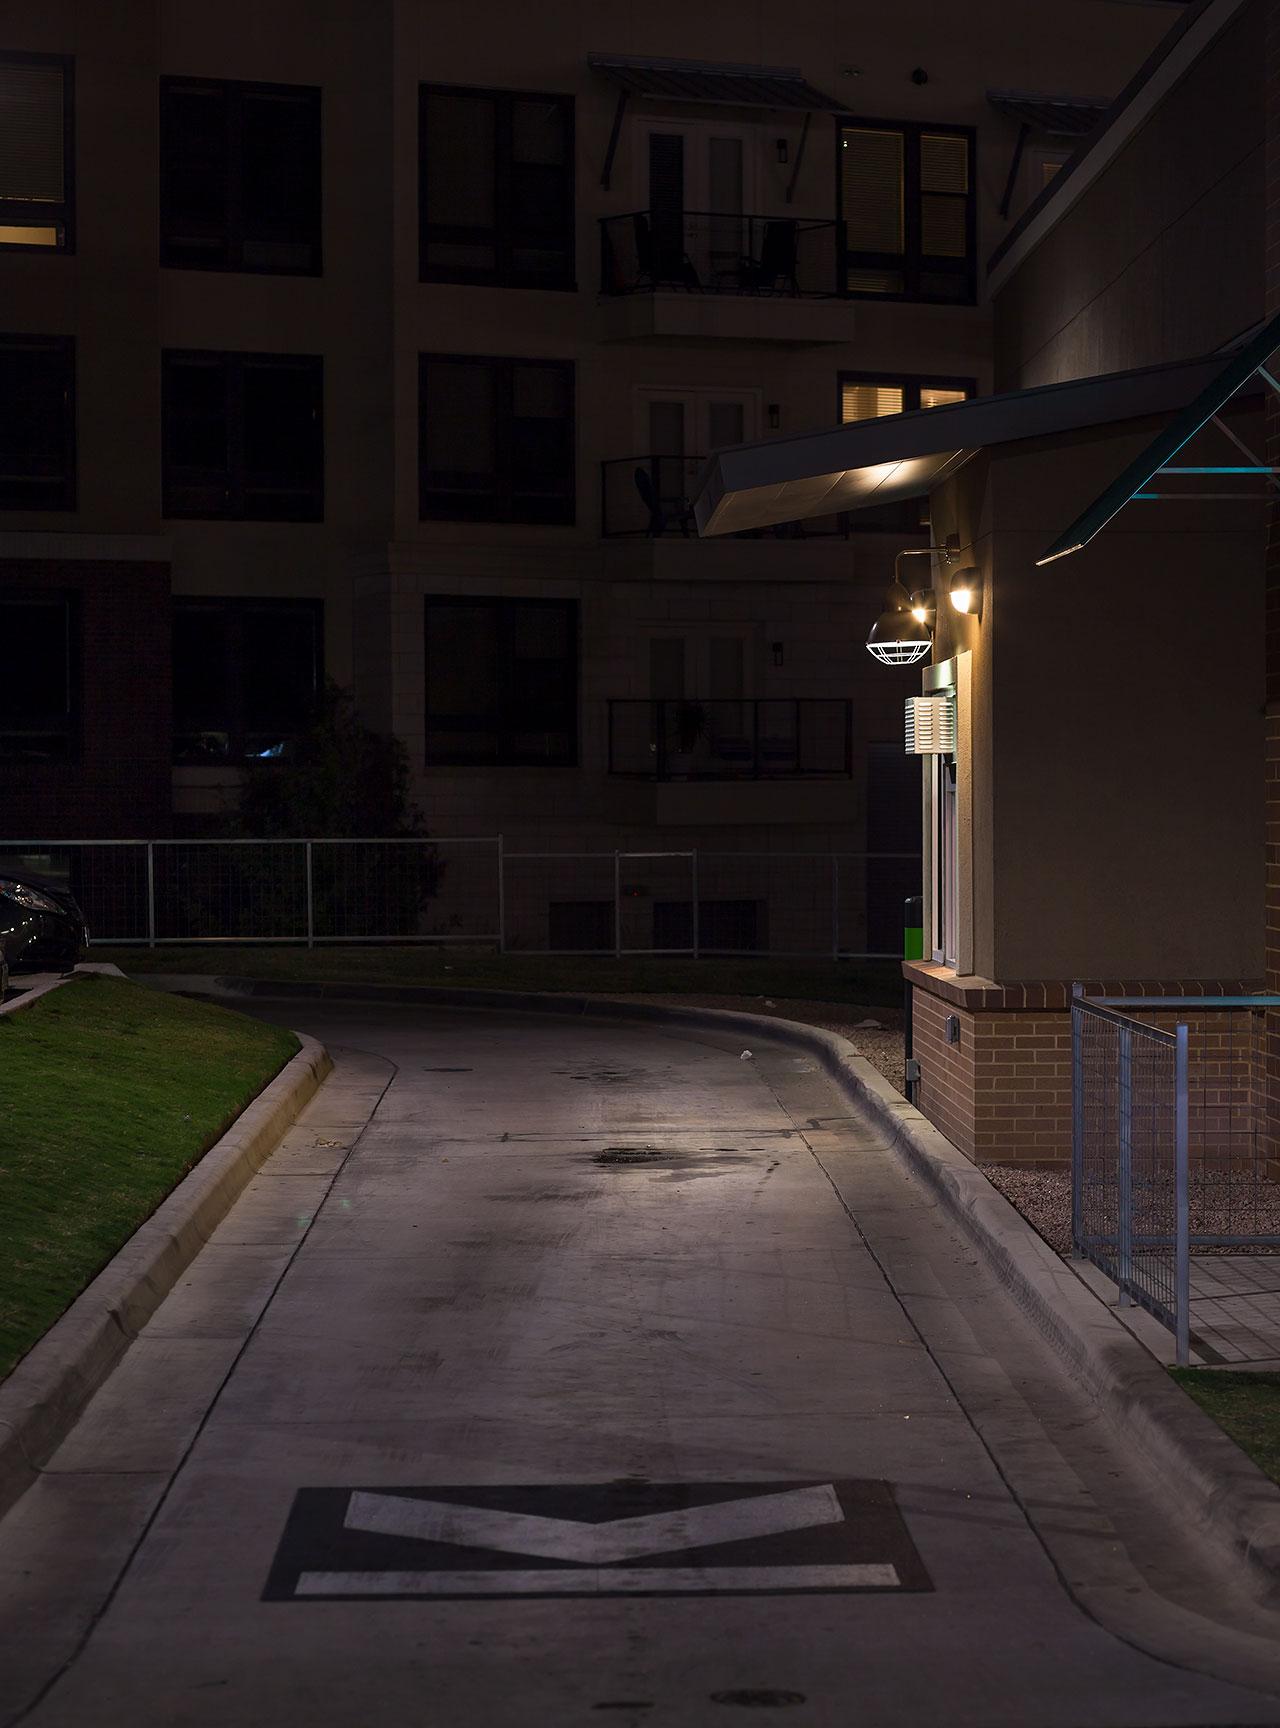 Driveland, © Mario Brand, Bielefeld / Germany, Architecture / Industry Category Winner, Felix Schoeller Photo Award